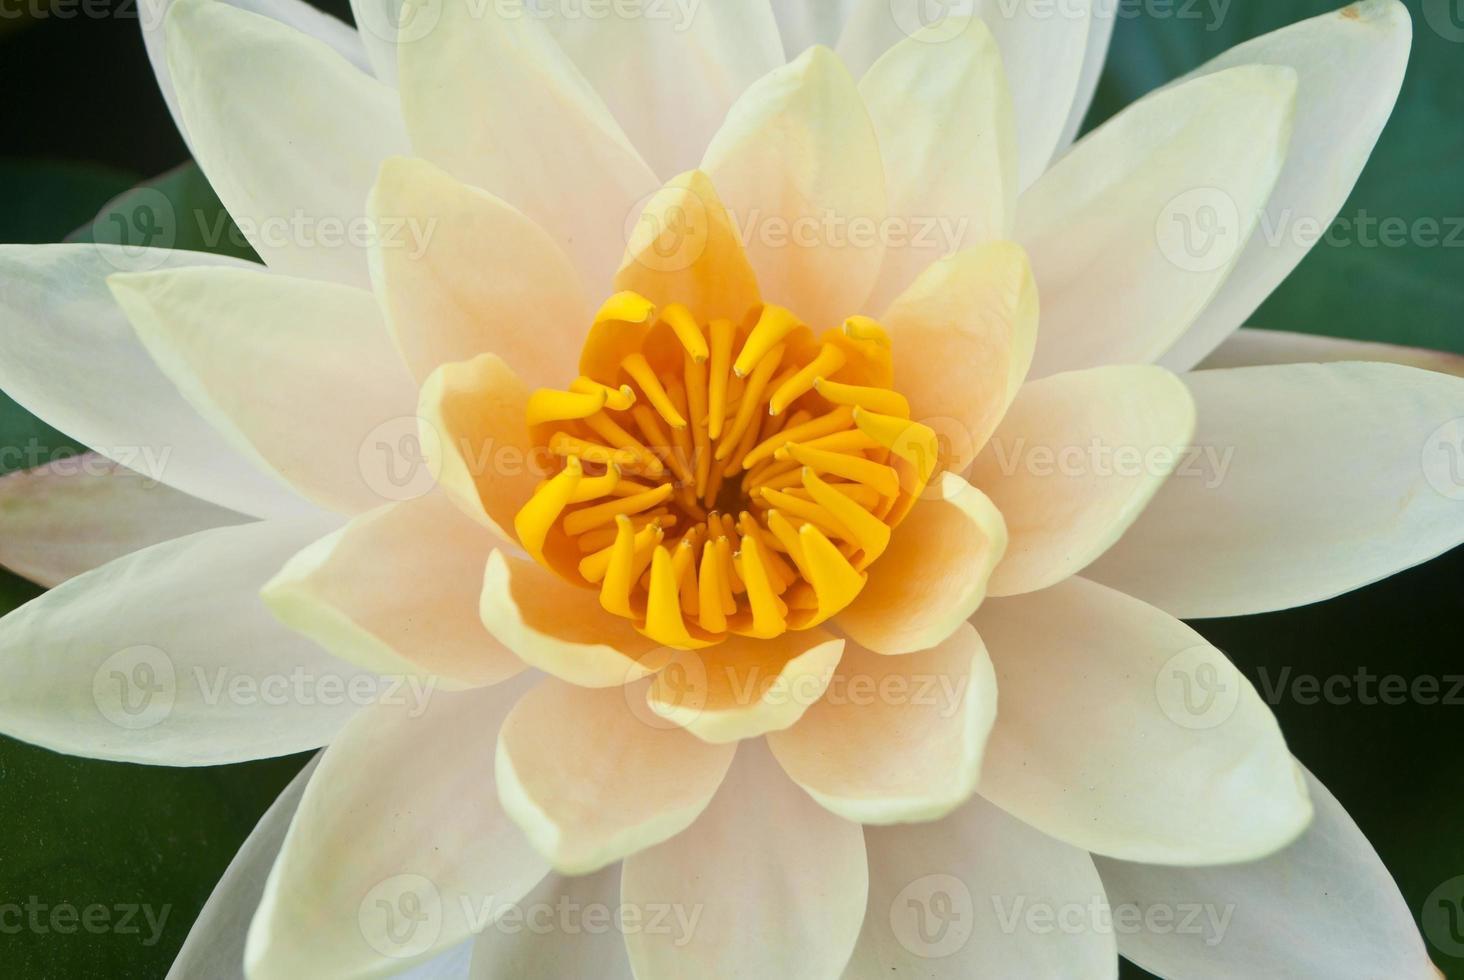 närbild gul lotusblomma vacker lotus. foto